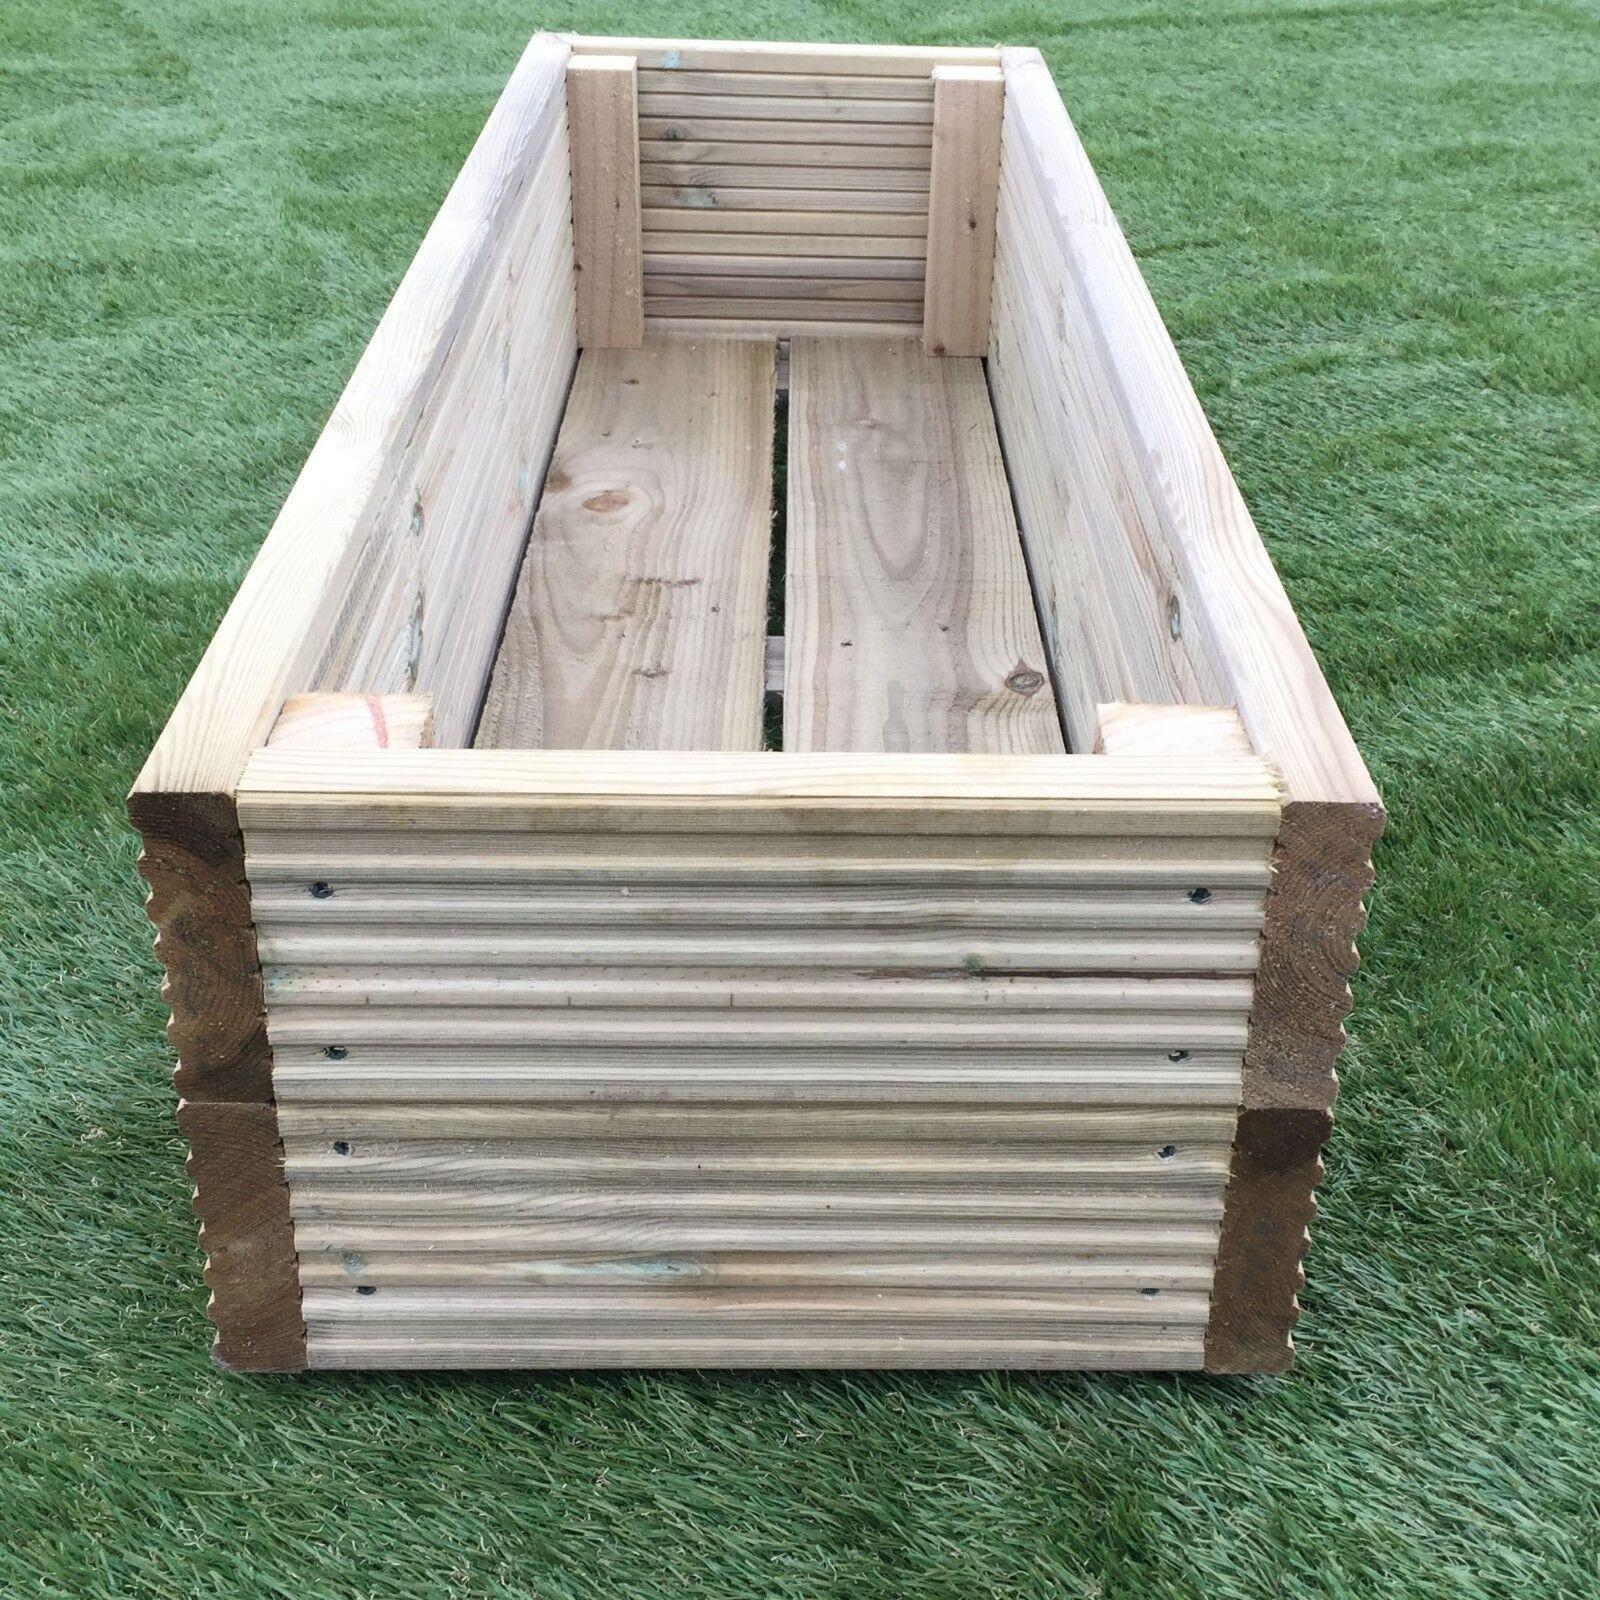 Details About Large Decking Wooden Garden Planter 0 6m 2ft 1 2m 4ft Or 8m 6ft